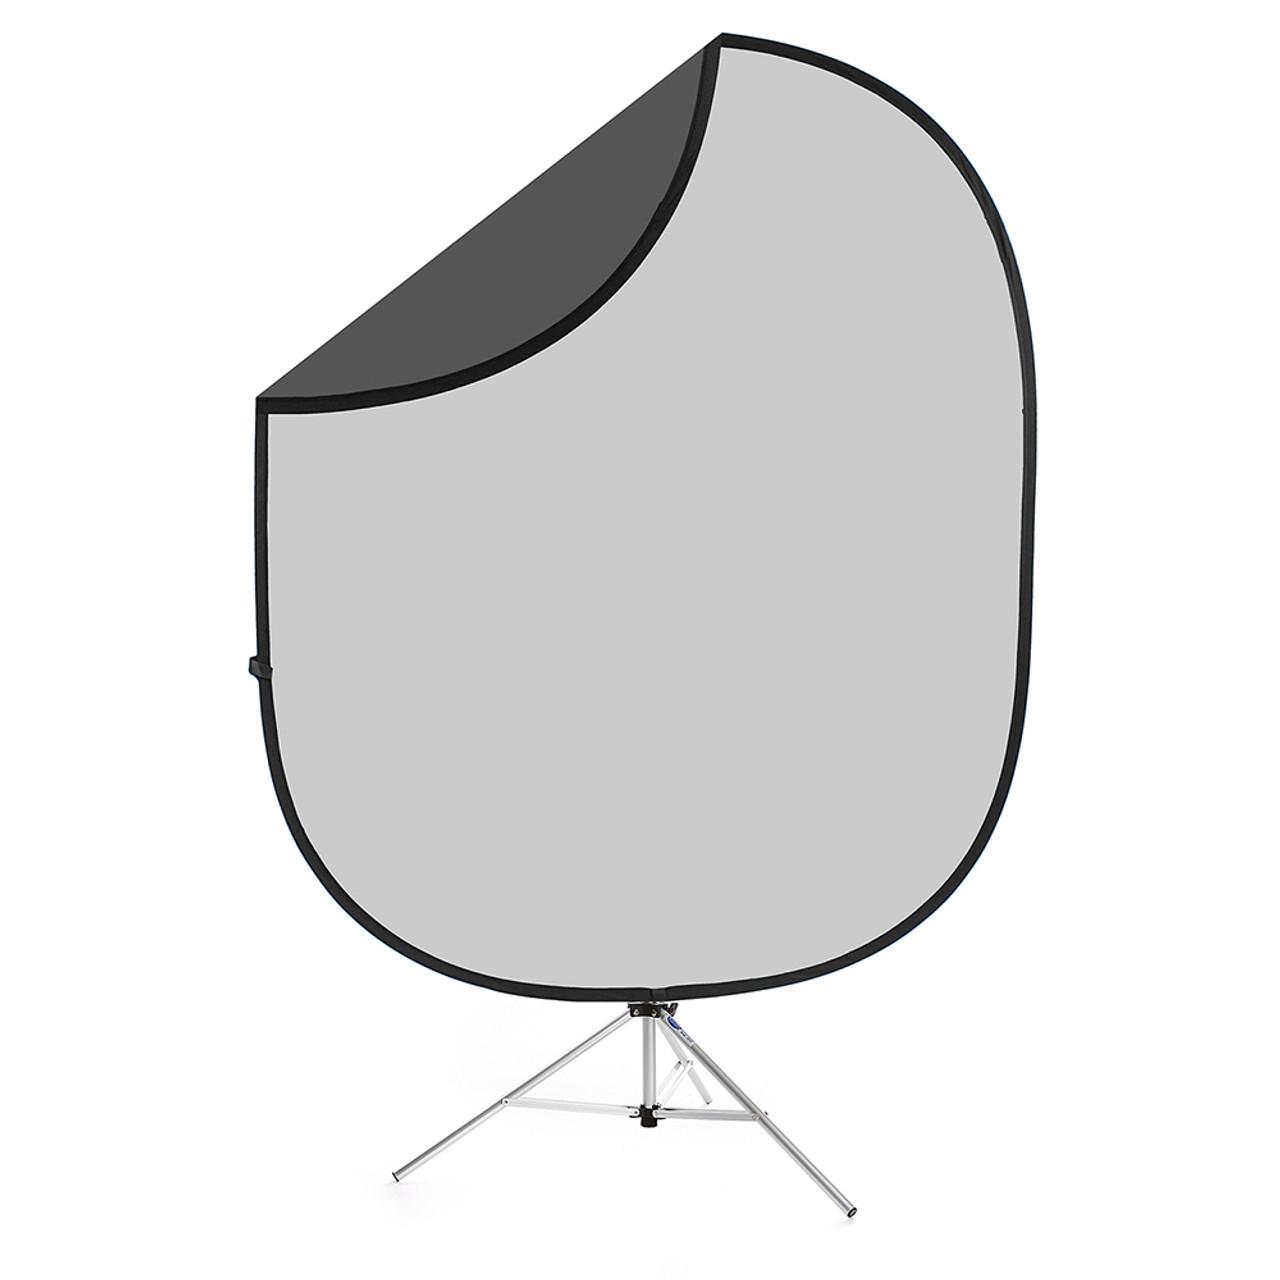 Collapsible Background Dark / Light Grey 6'x7'